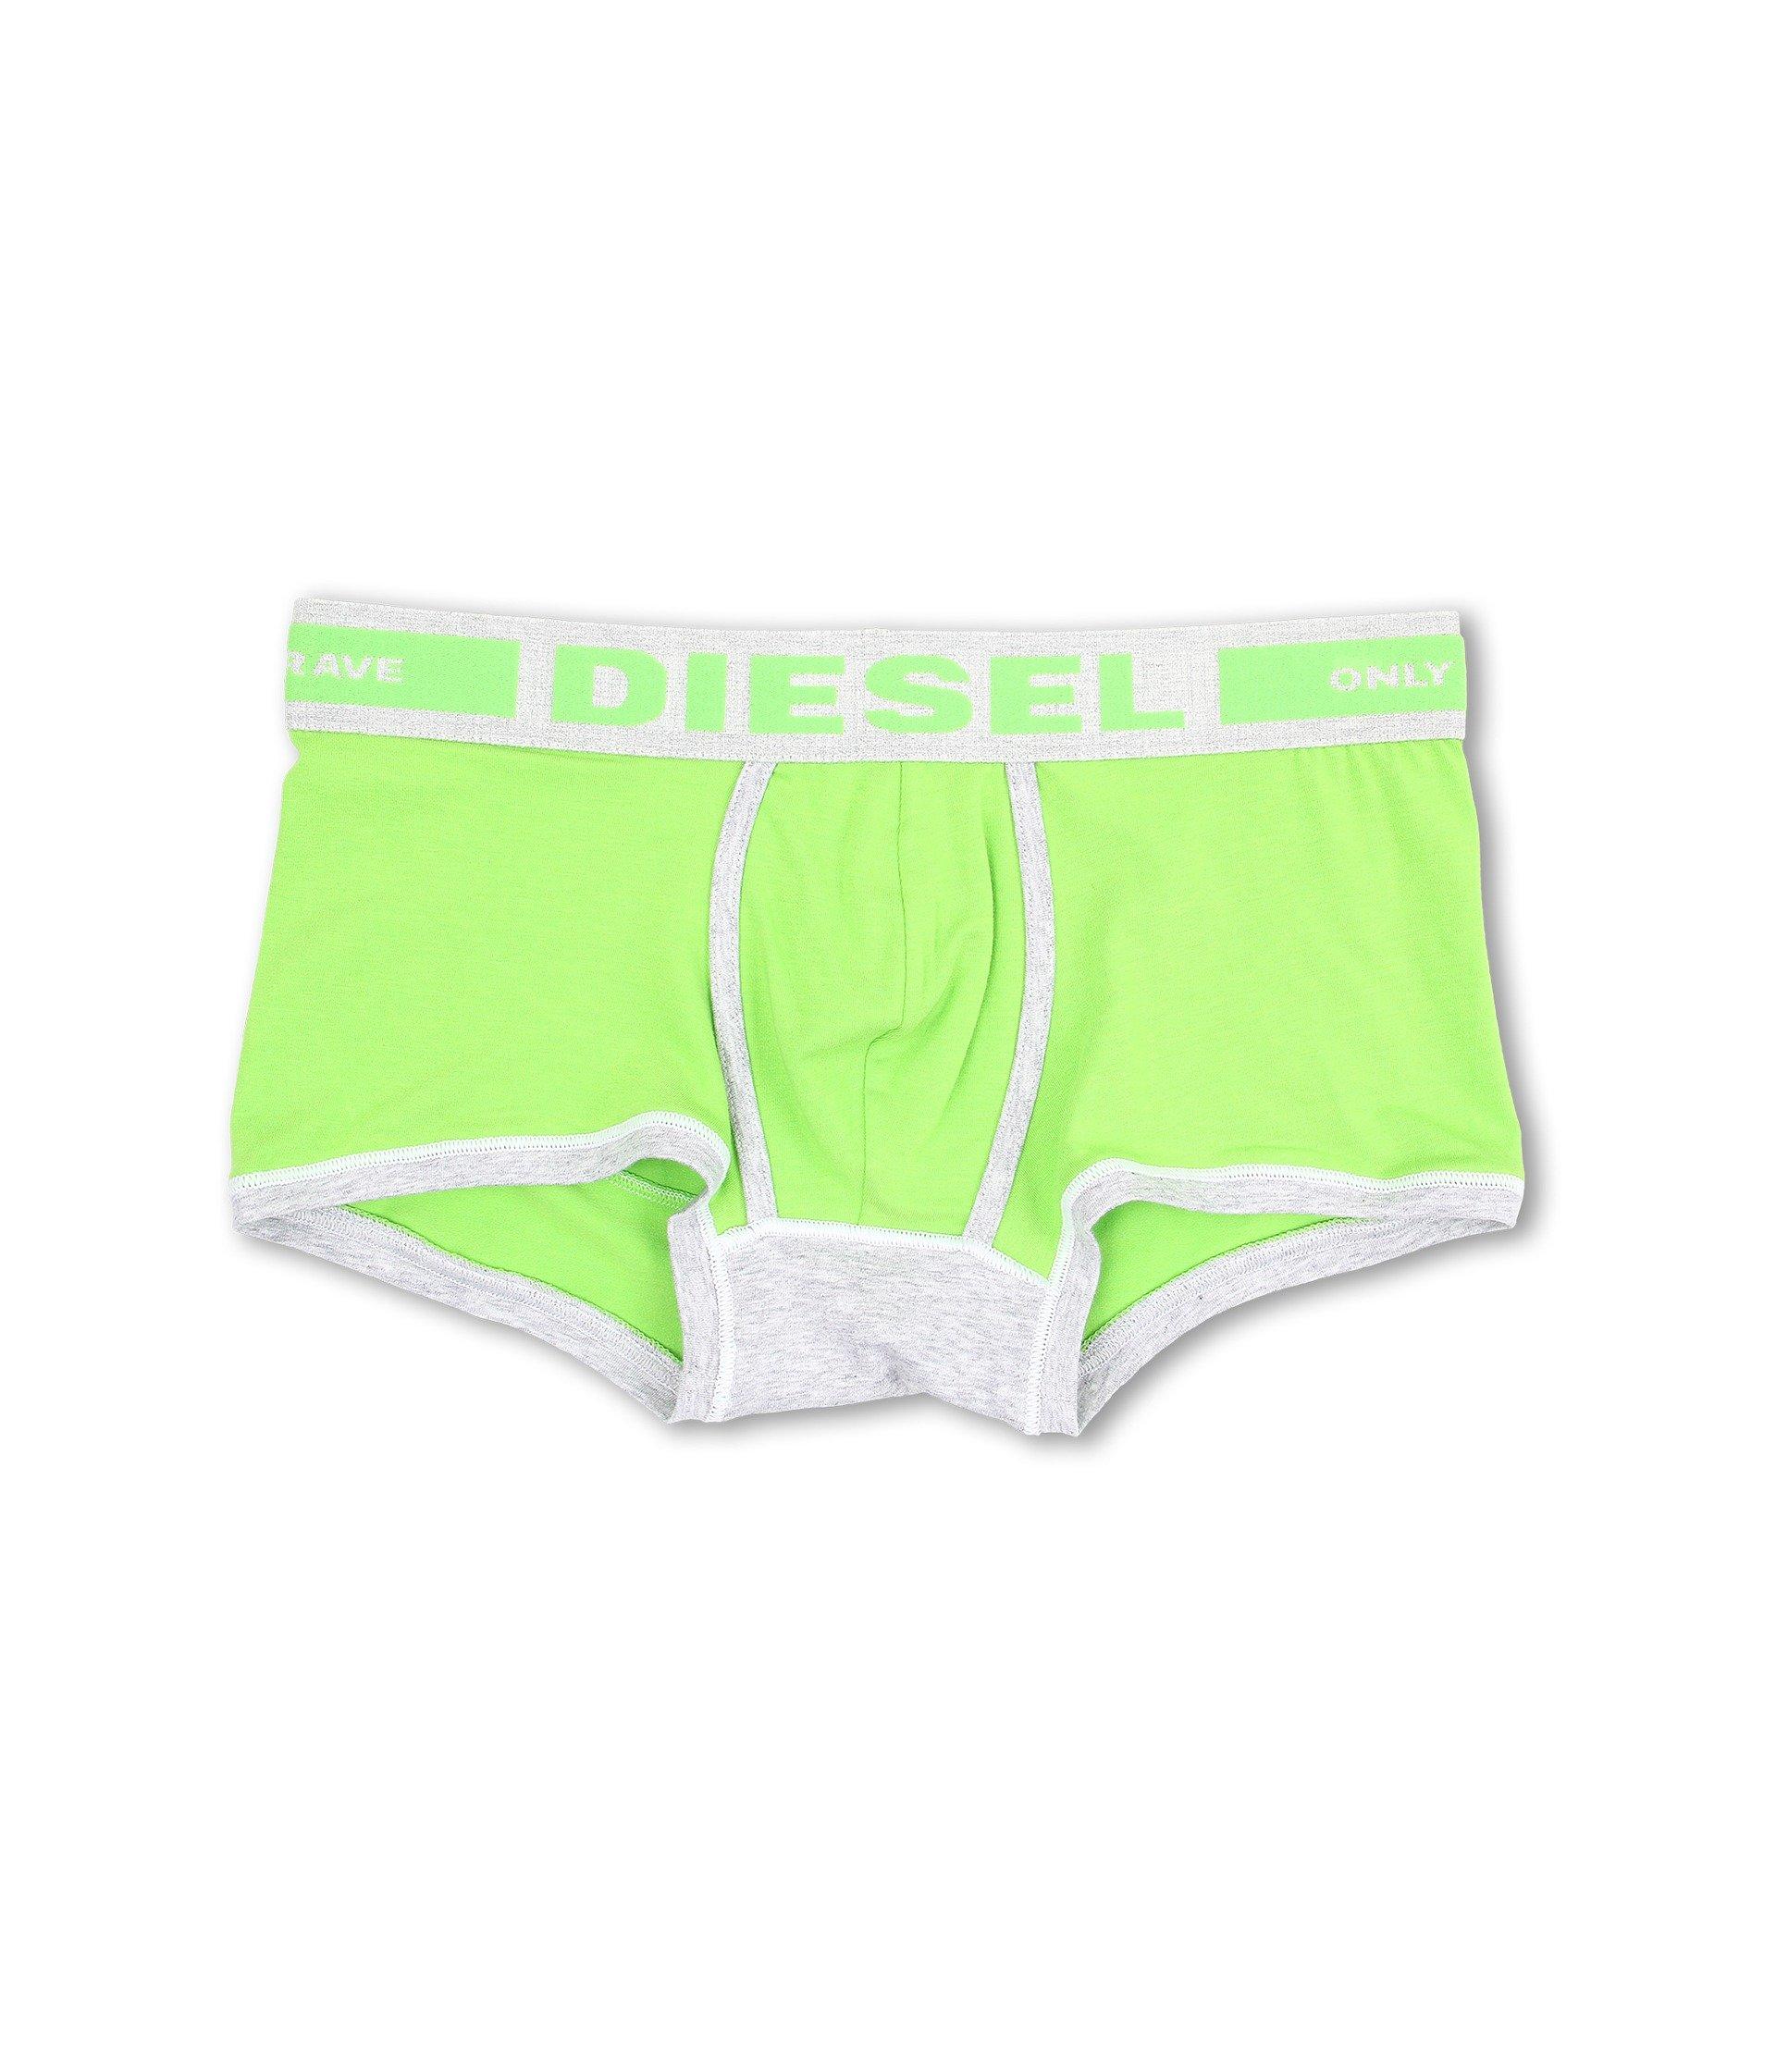 Ropa Interior para Hombre Diesel Hero Boxer Shorts TAIM  + Diesel en VeoyCompro.net